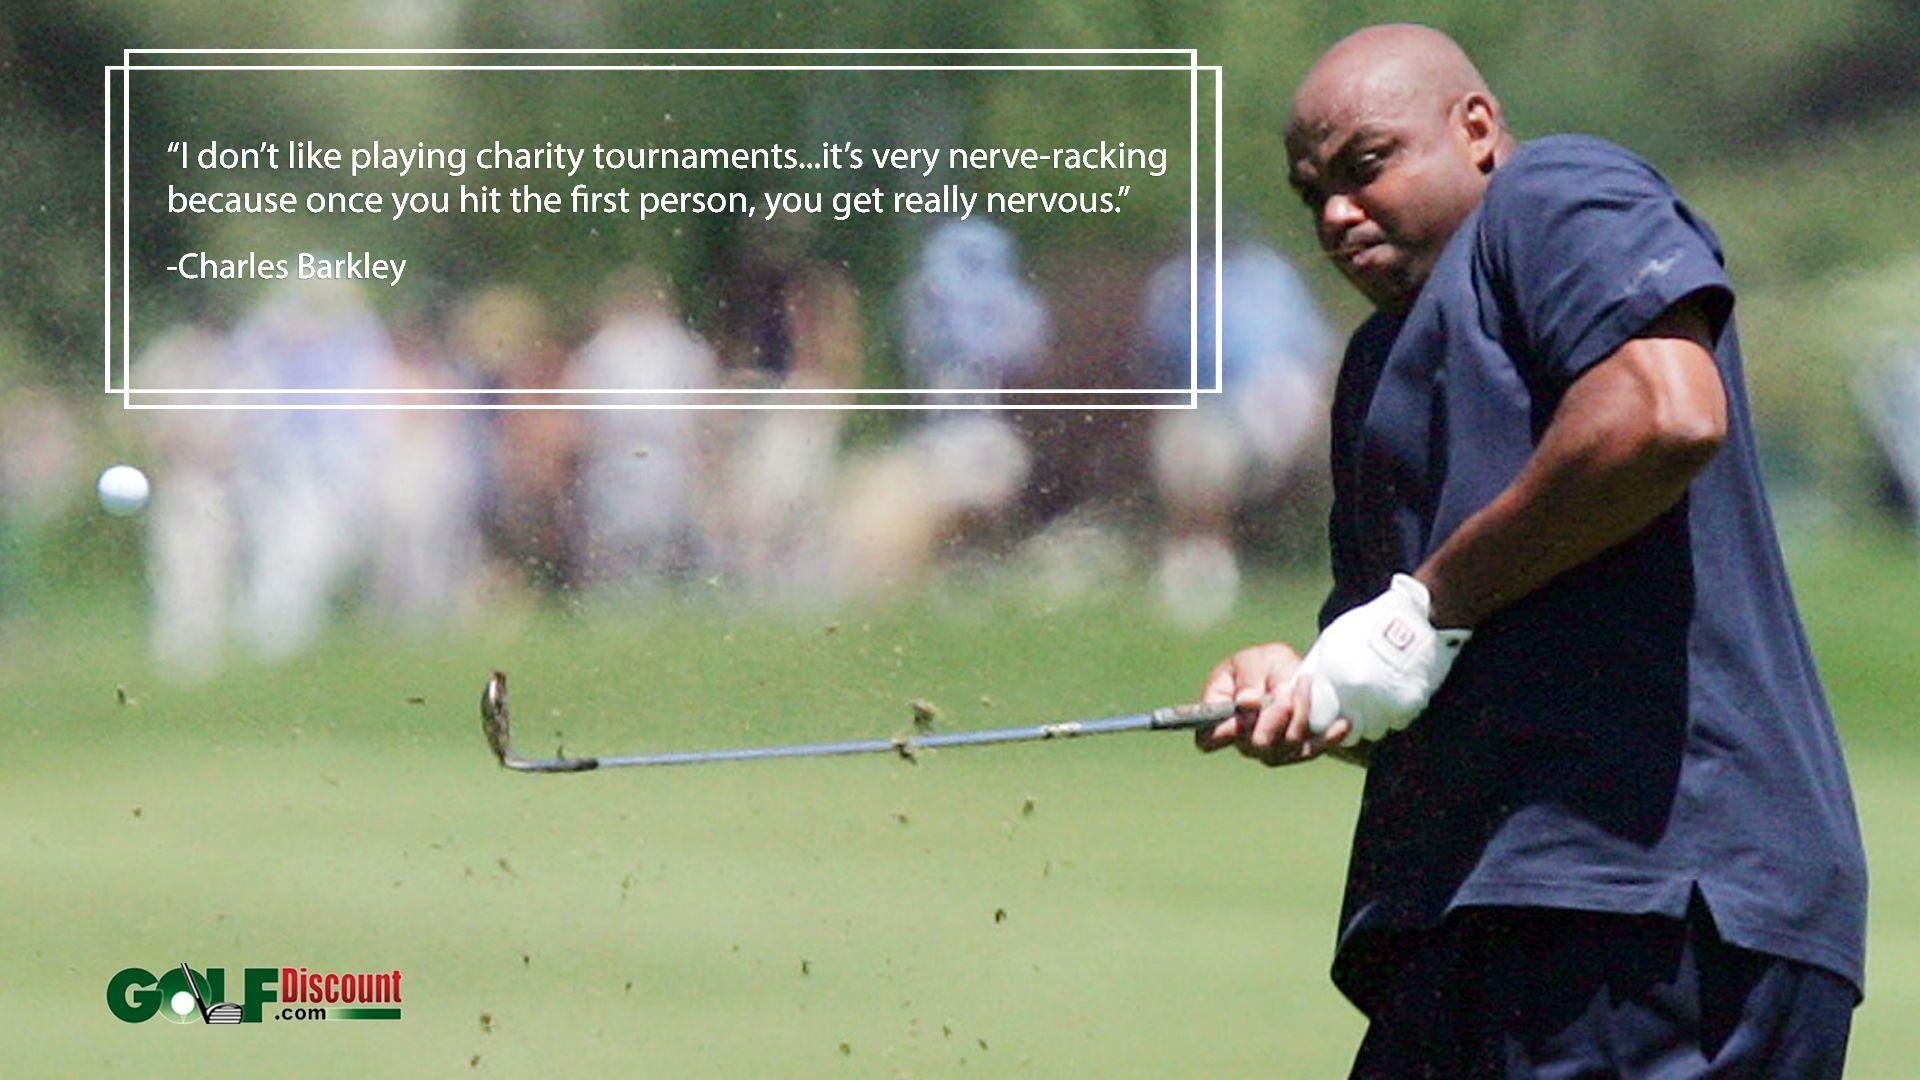 20+ Charles barkley funny golf swing viral